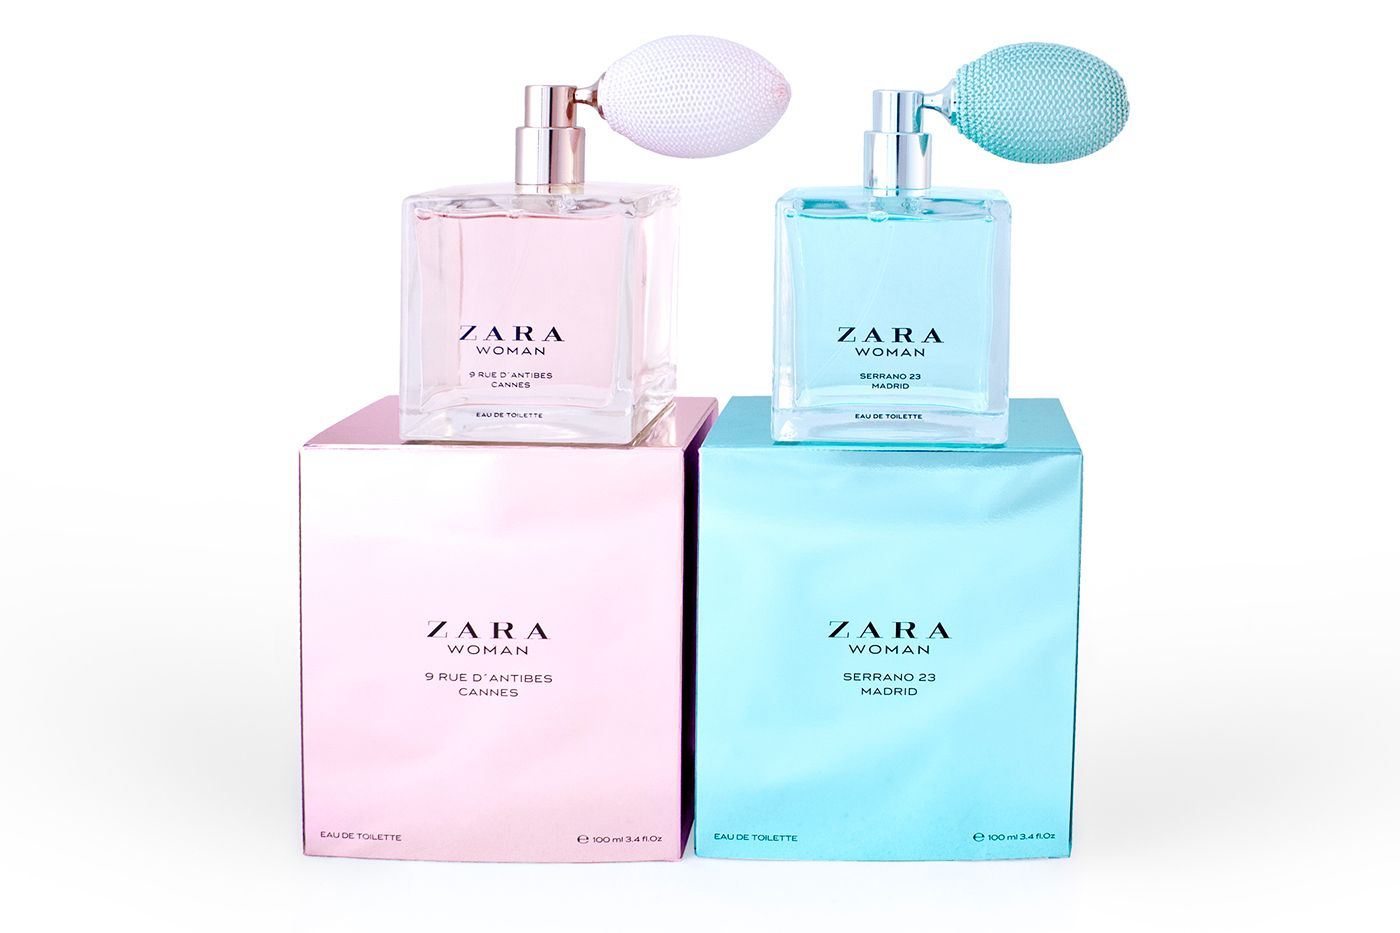 Women Serrano Zara BehancePerfume On Cannesamp; Woman zMGLpVqUS